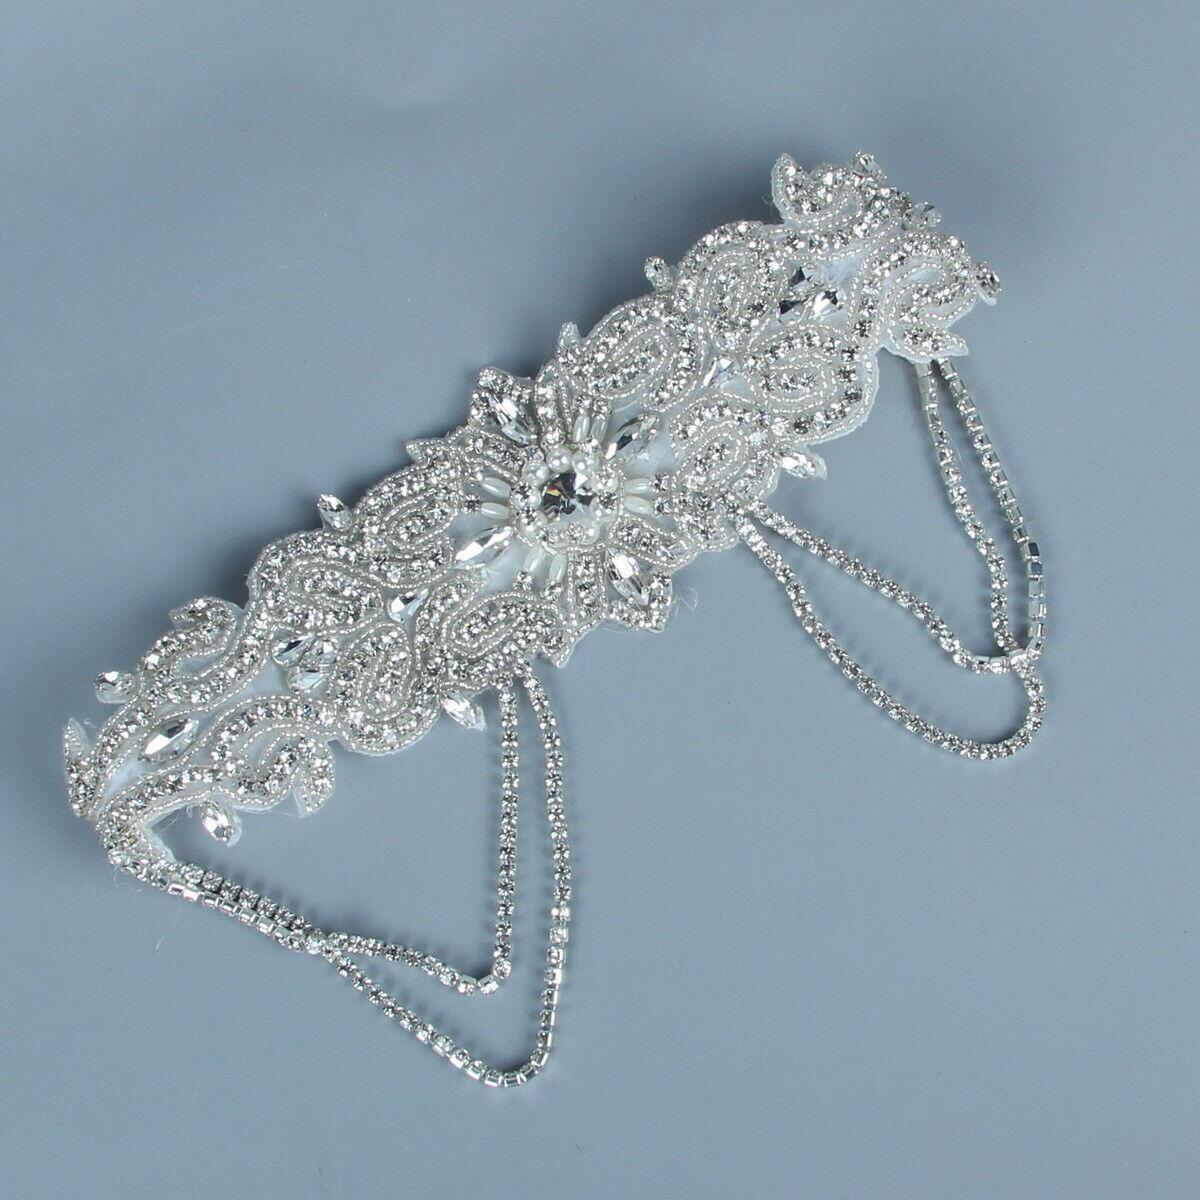 1920s Headband Wedding Silver Bridal Great Gatsby 20s Flapper Headpiece Gangster